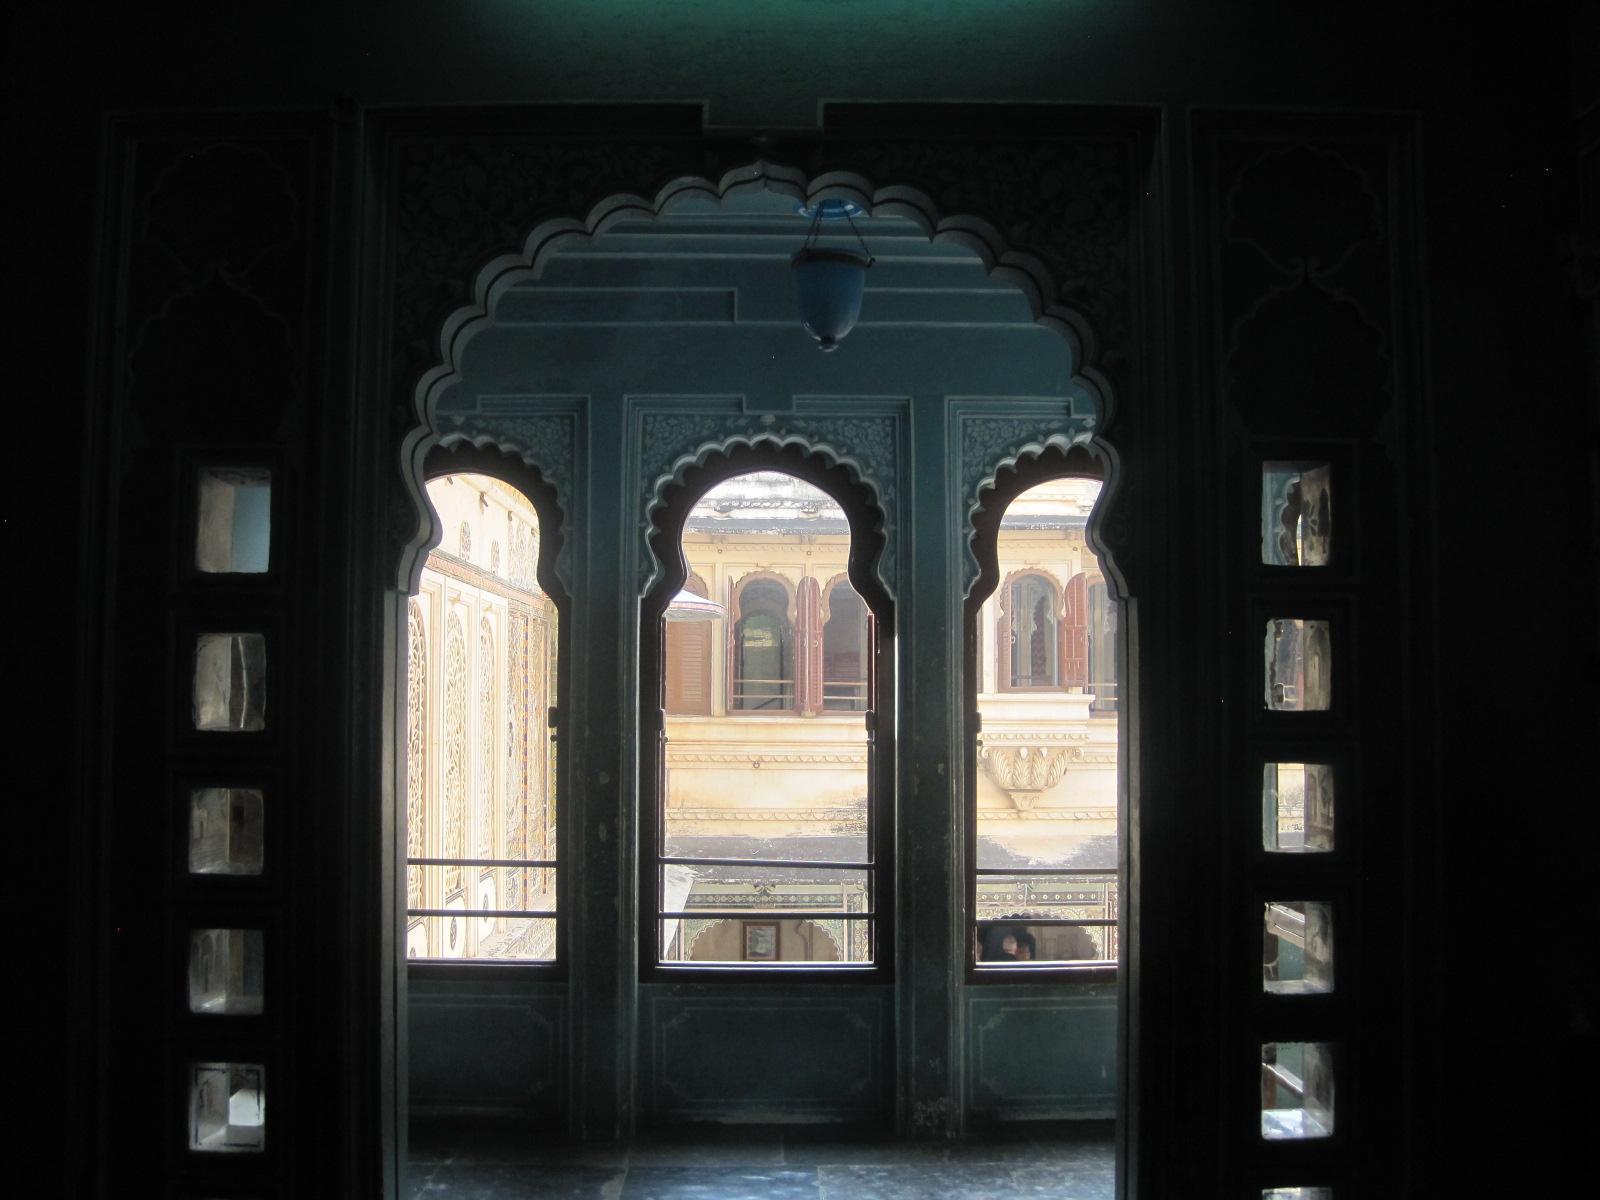 Something about those keyhole arches.